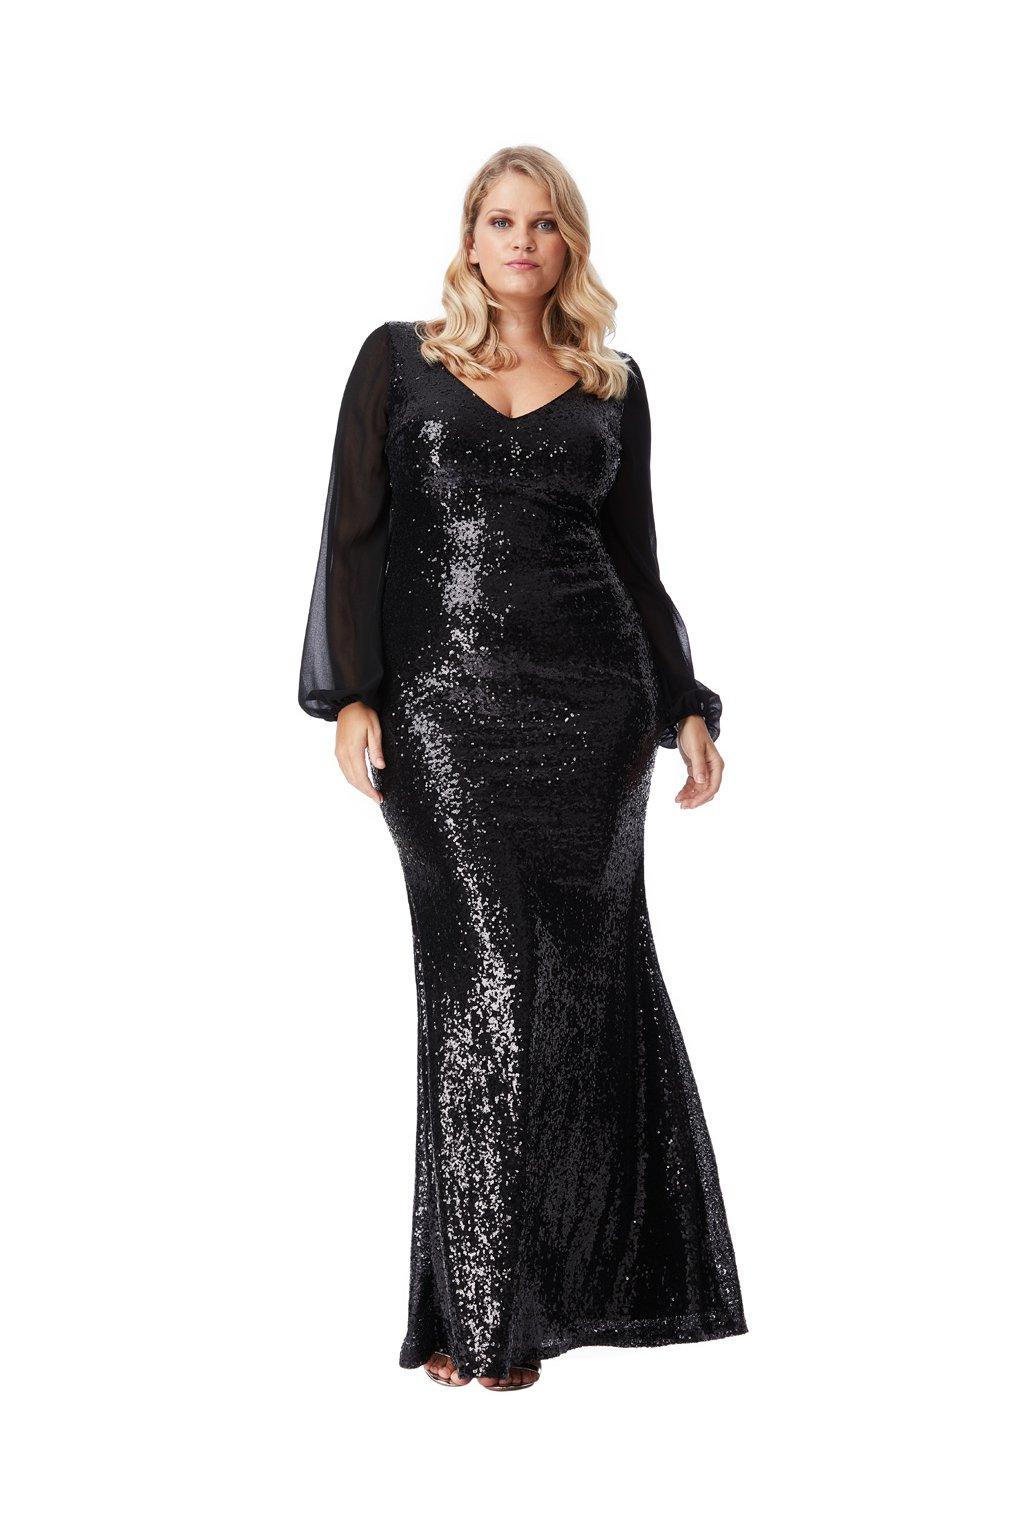 Dlouhé plesové šaty Sofi s flitry černé - Bellazu.cz 1e4f075565